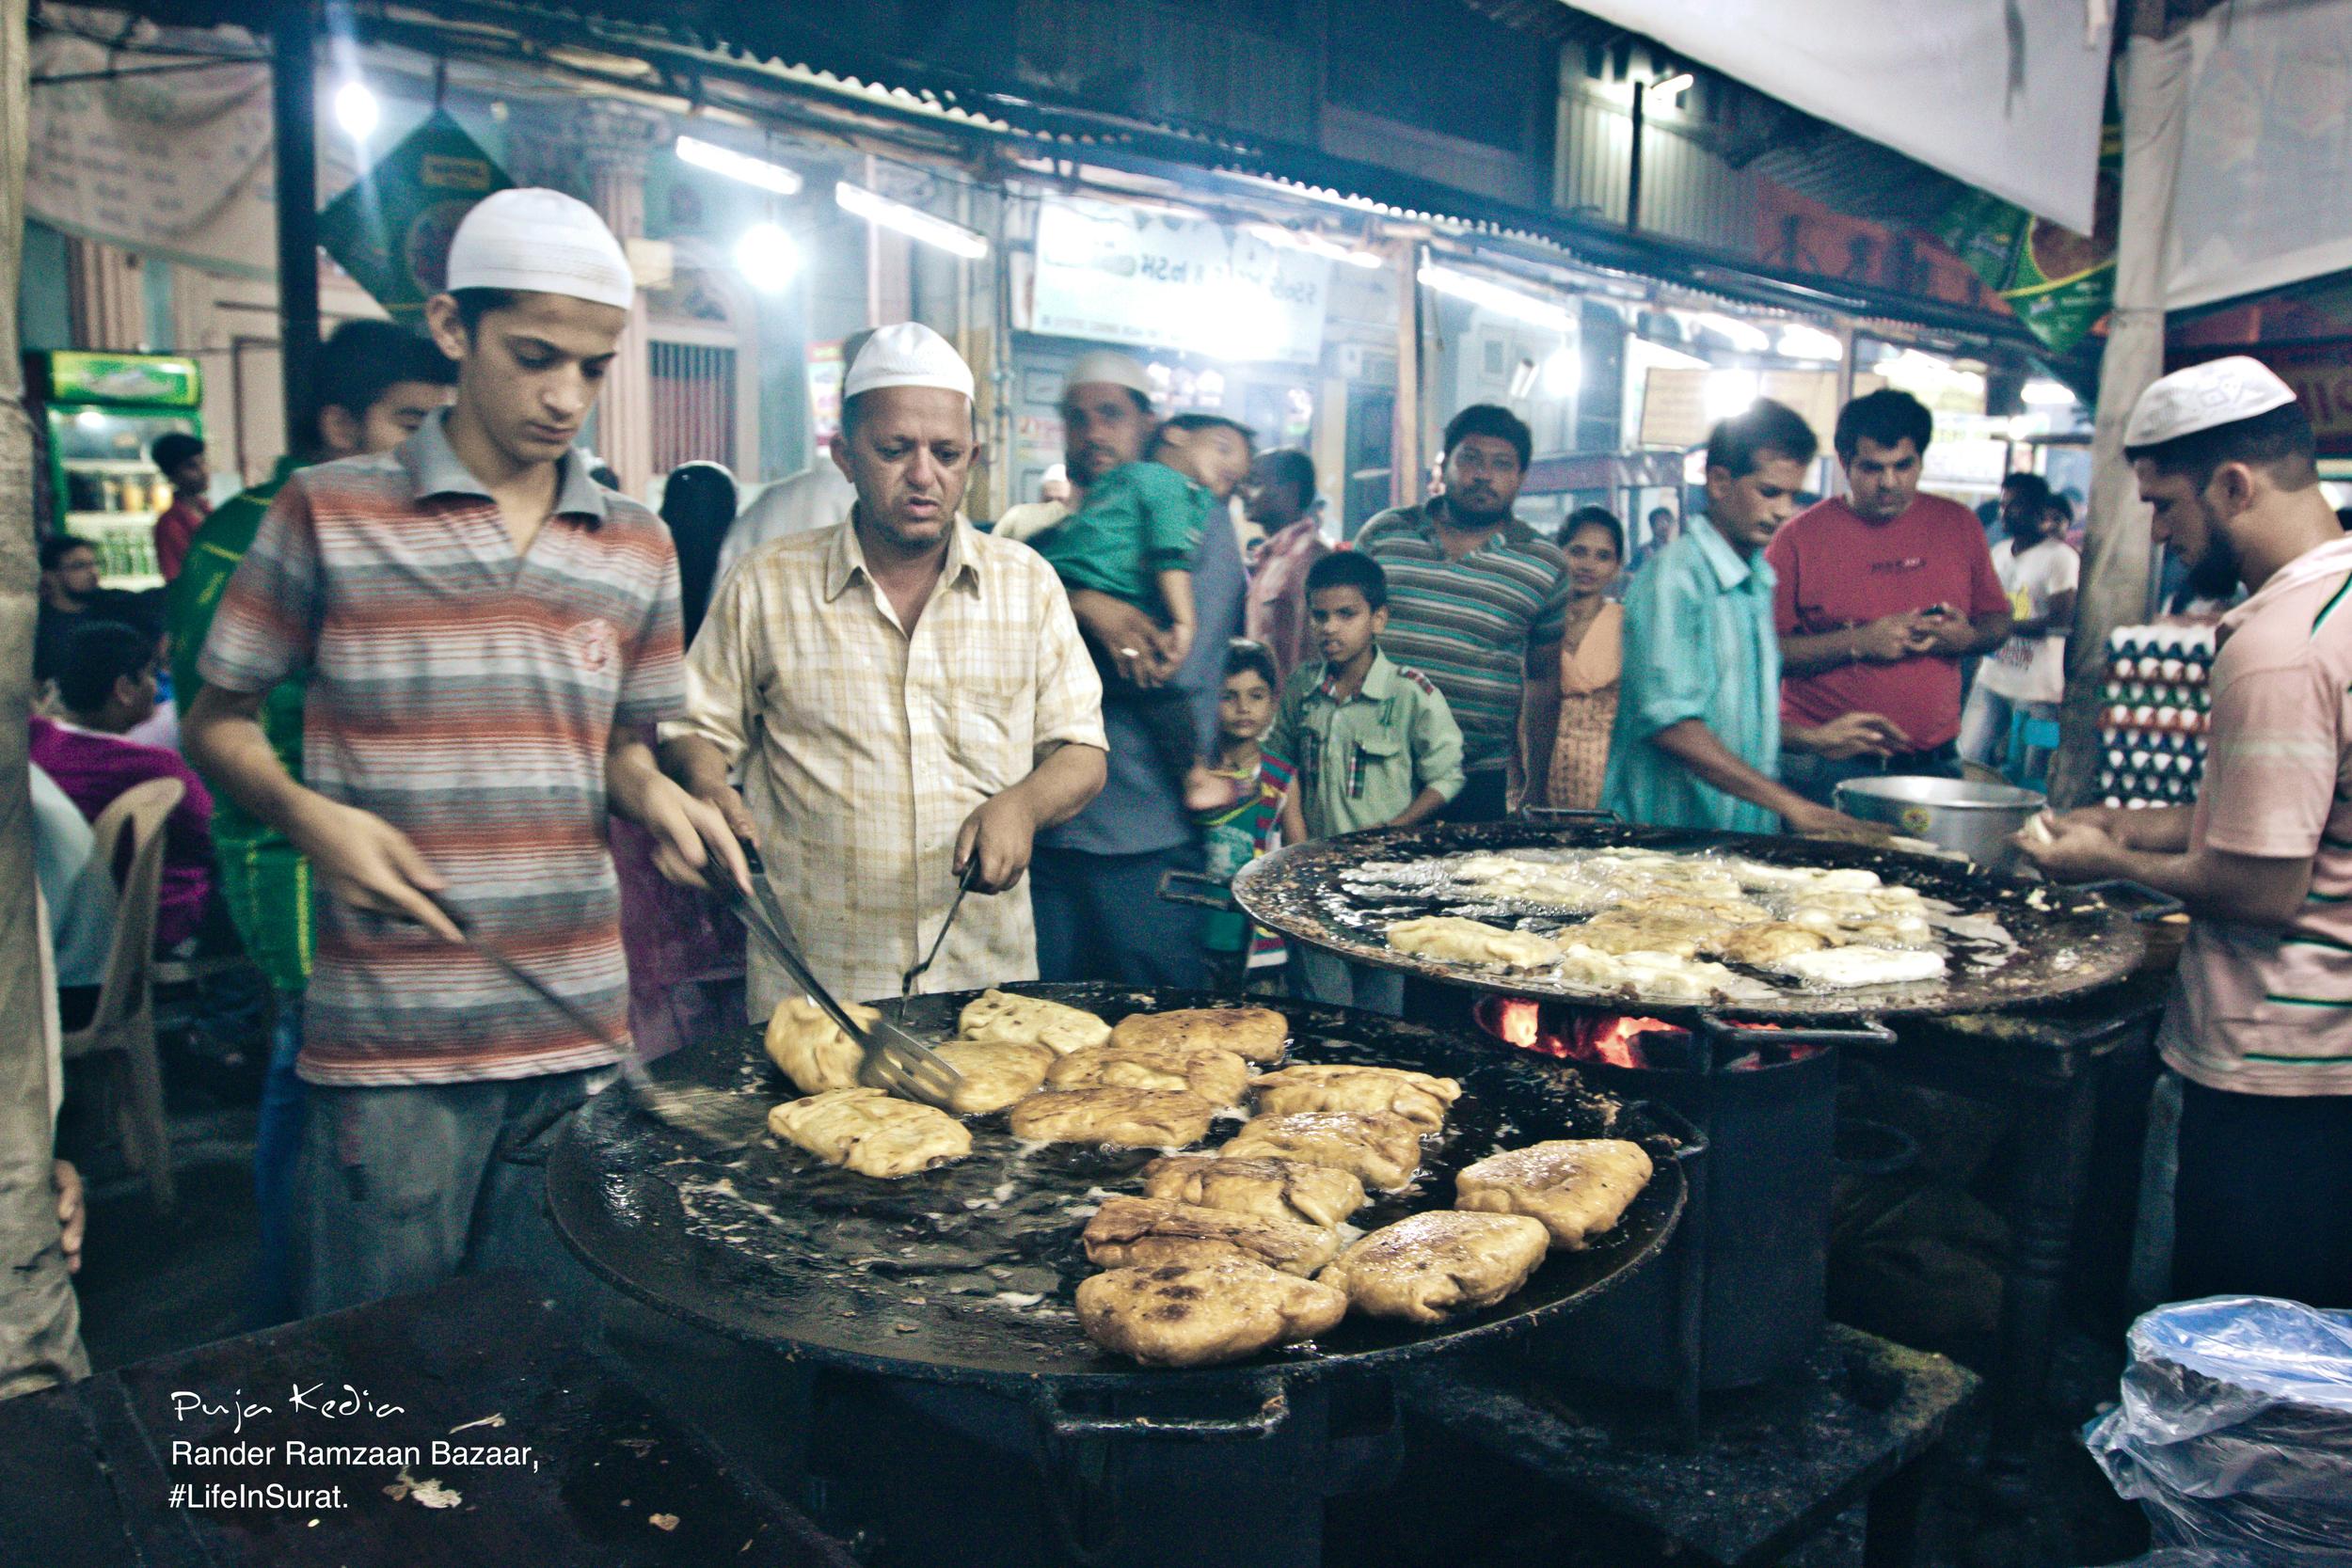 Rander Ramzaan Bazaar Kesubhai's